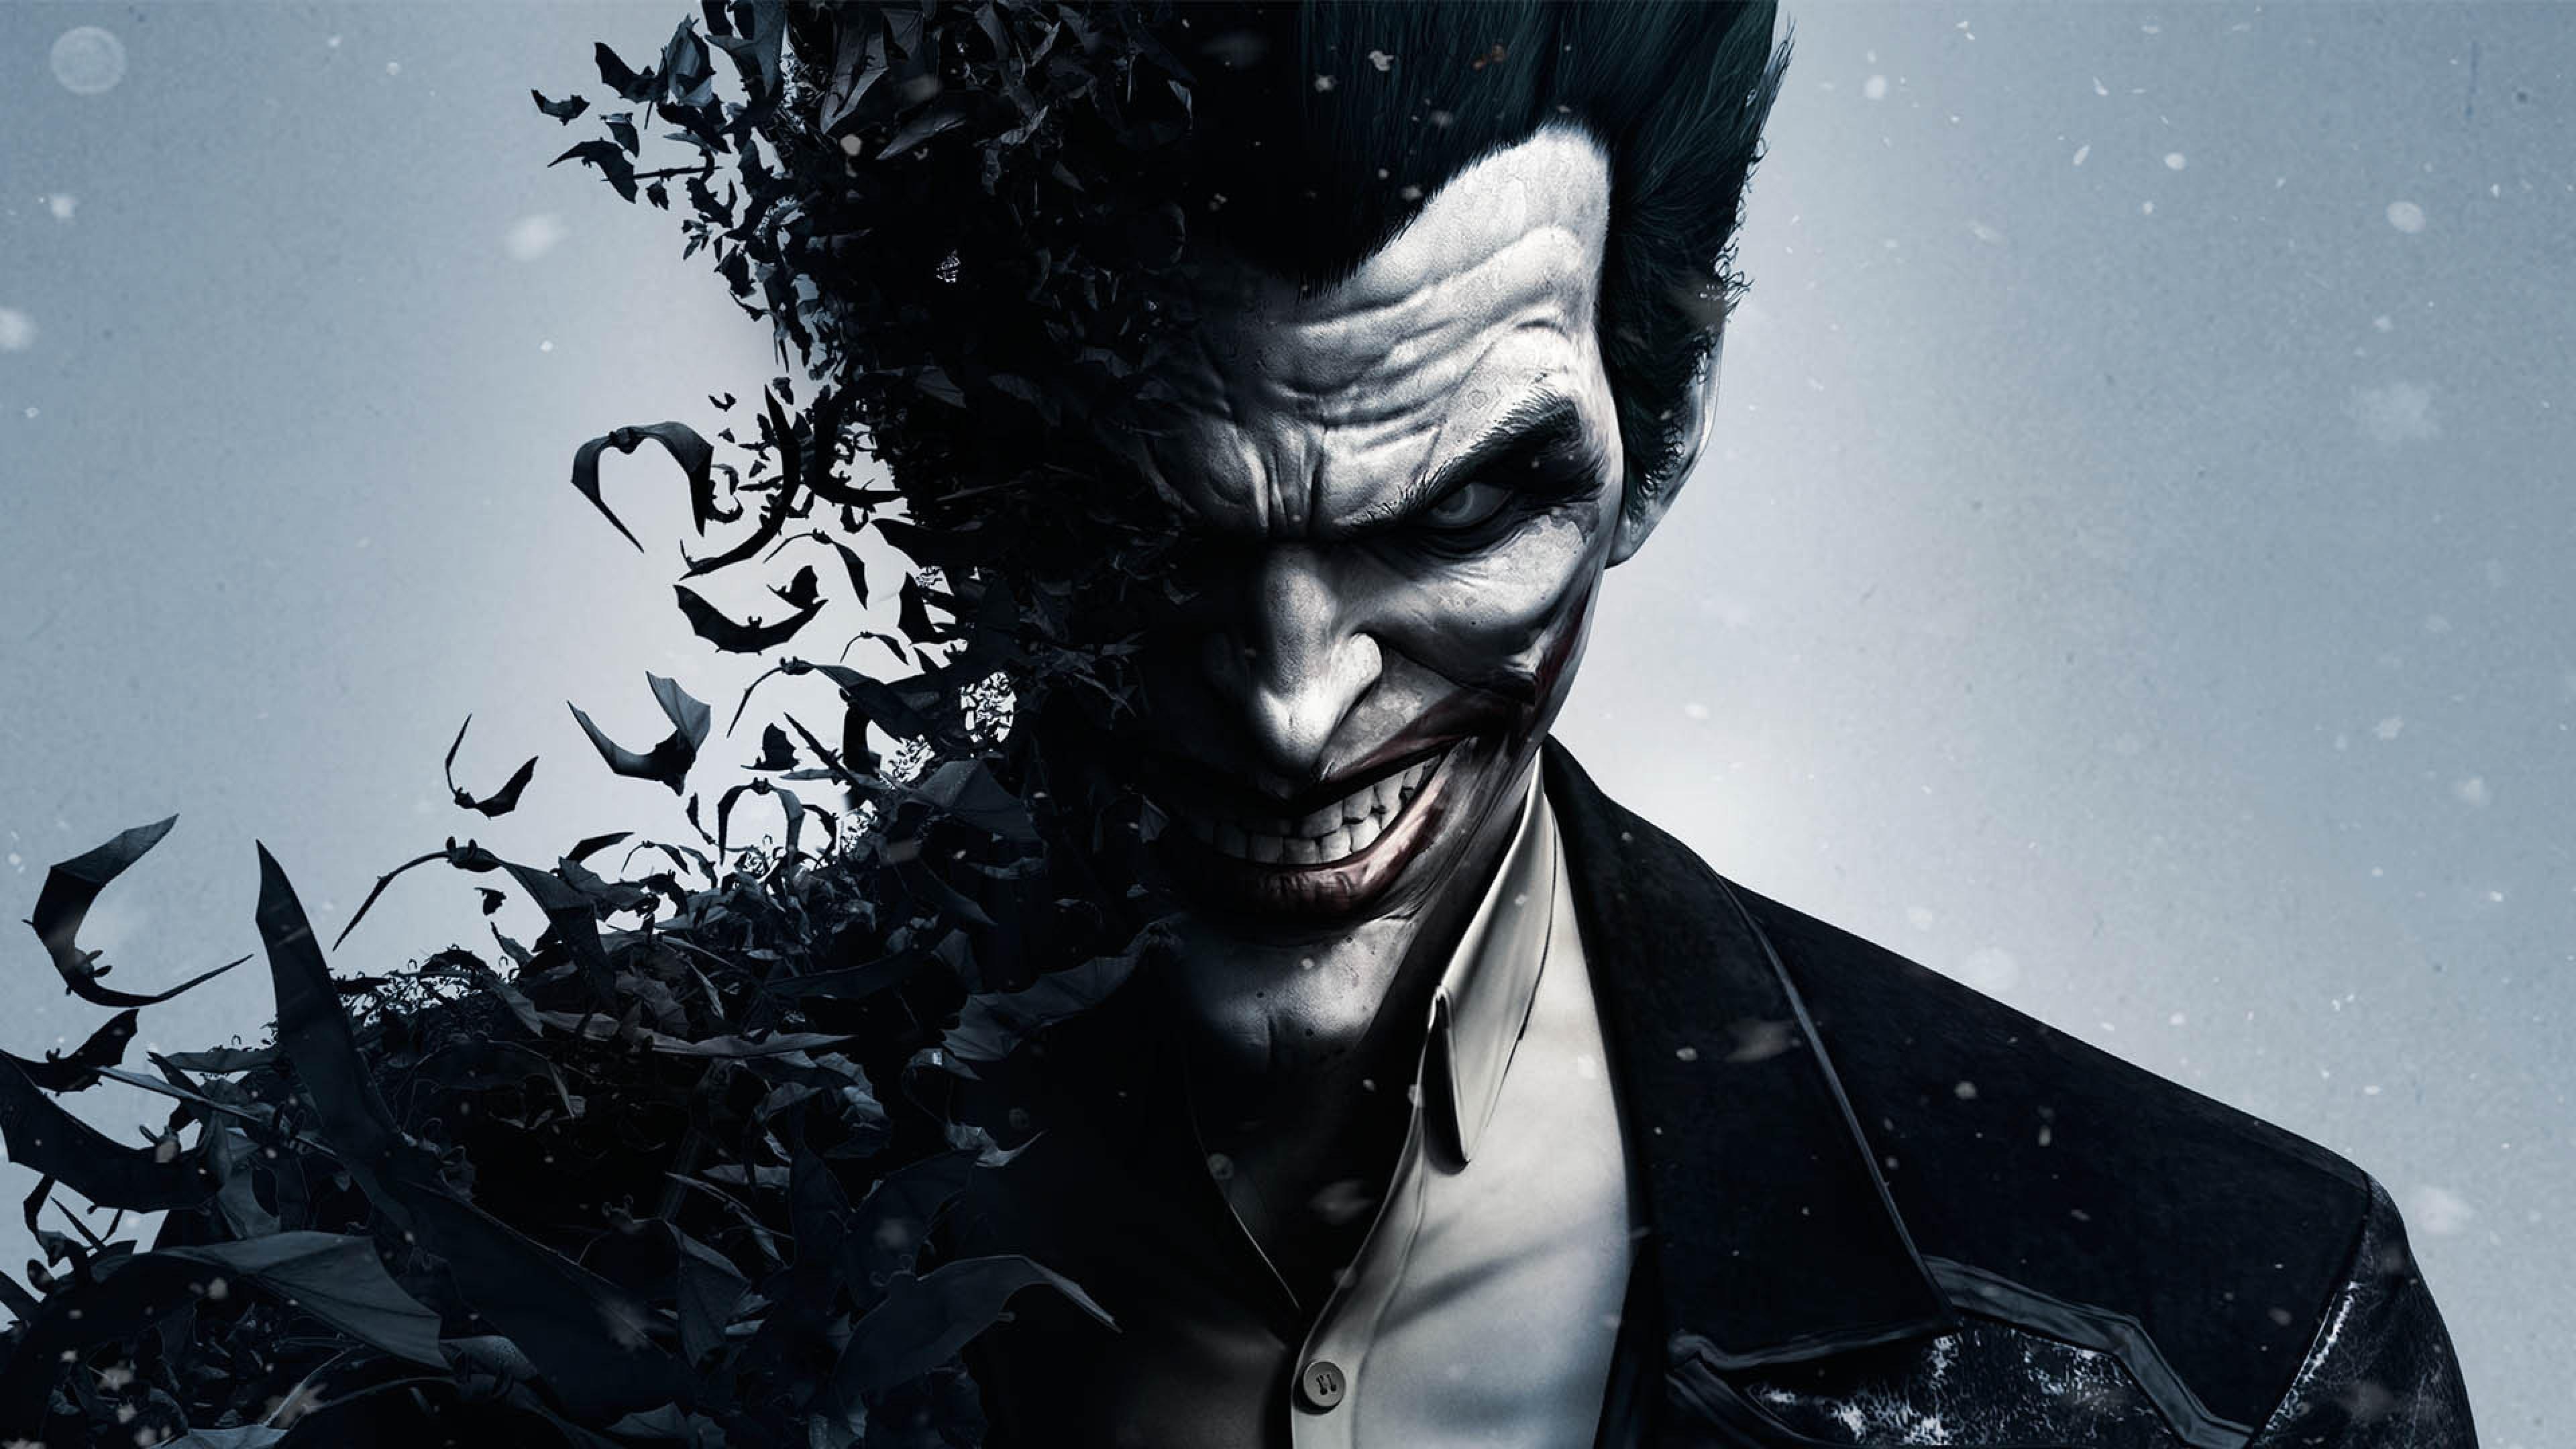 Preview wallpaper batman arkham origins, joker, red cap, warner bros  interactive entertainment,